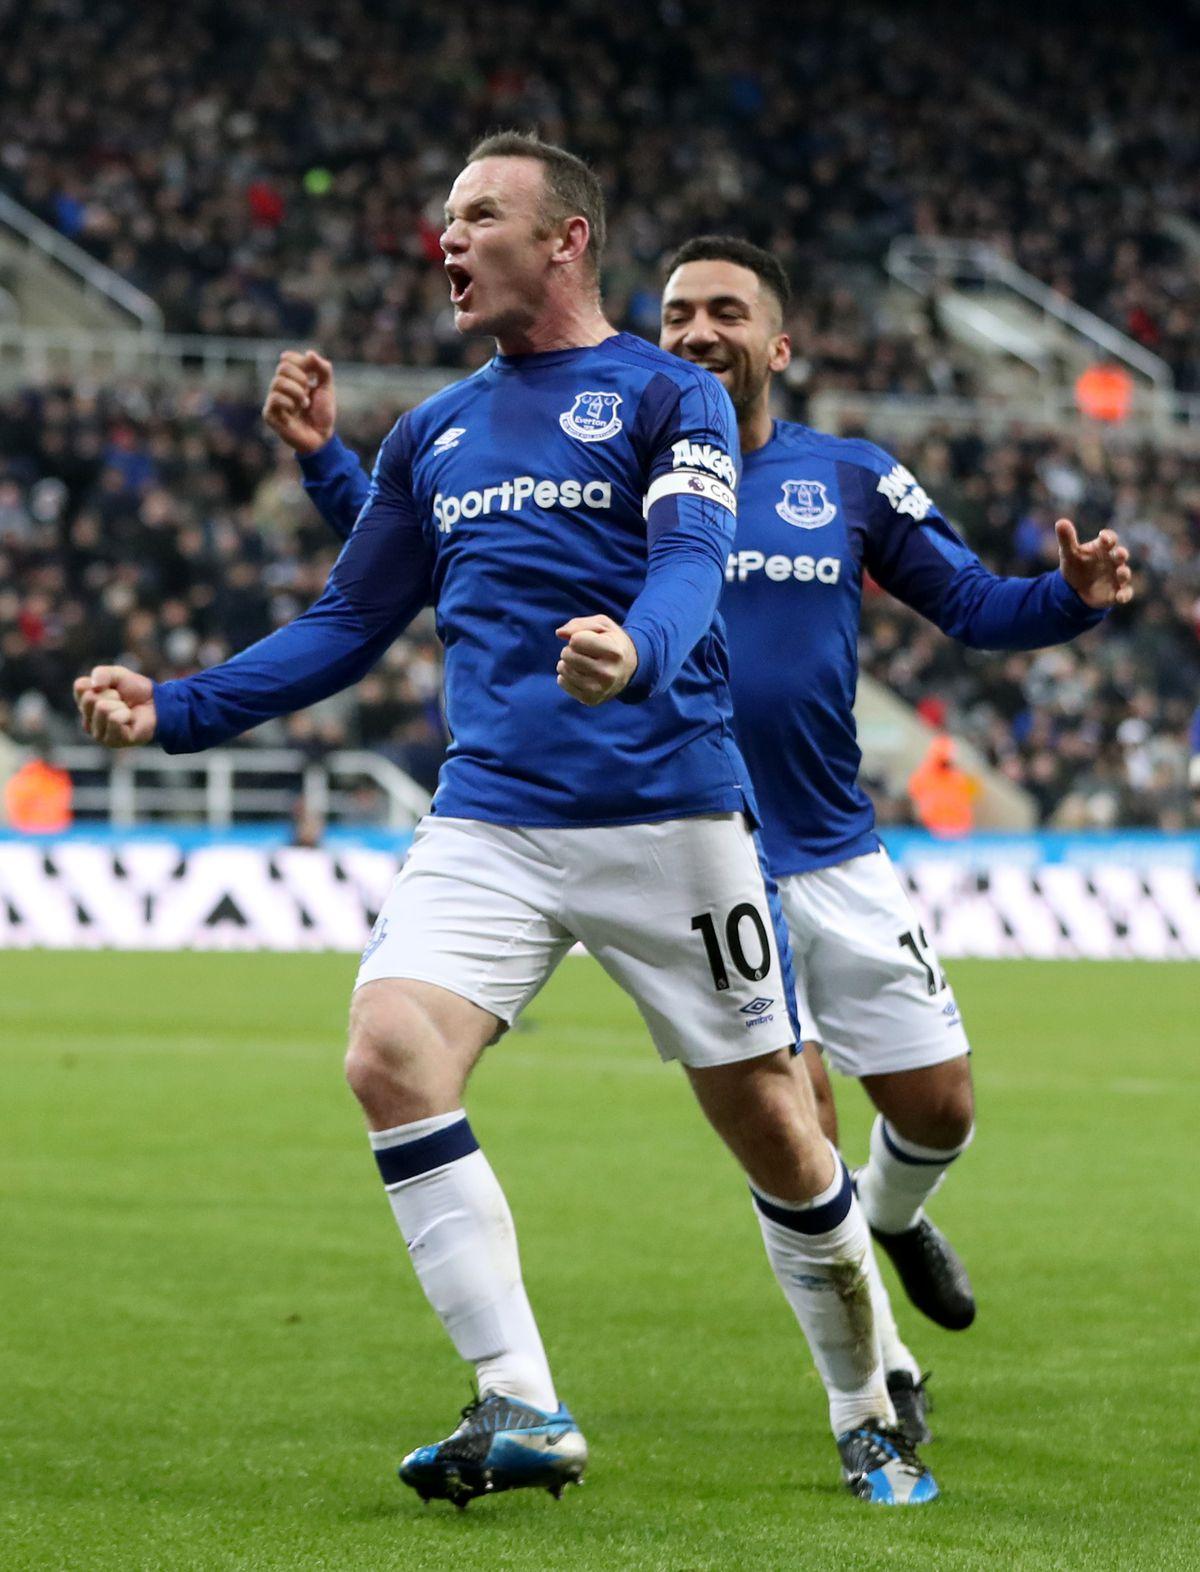 Newcastle United v Everton - Premier League